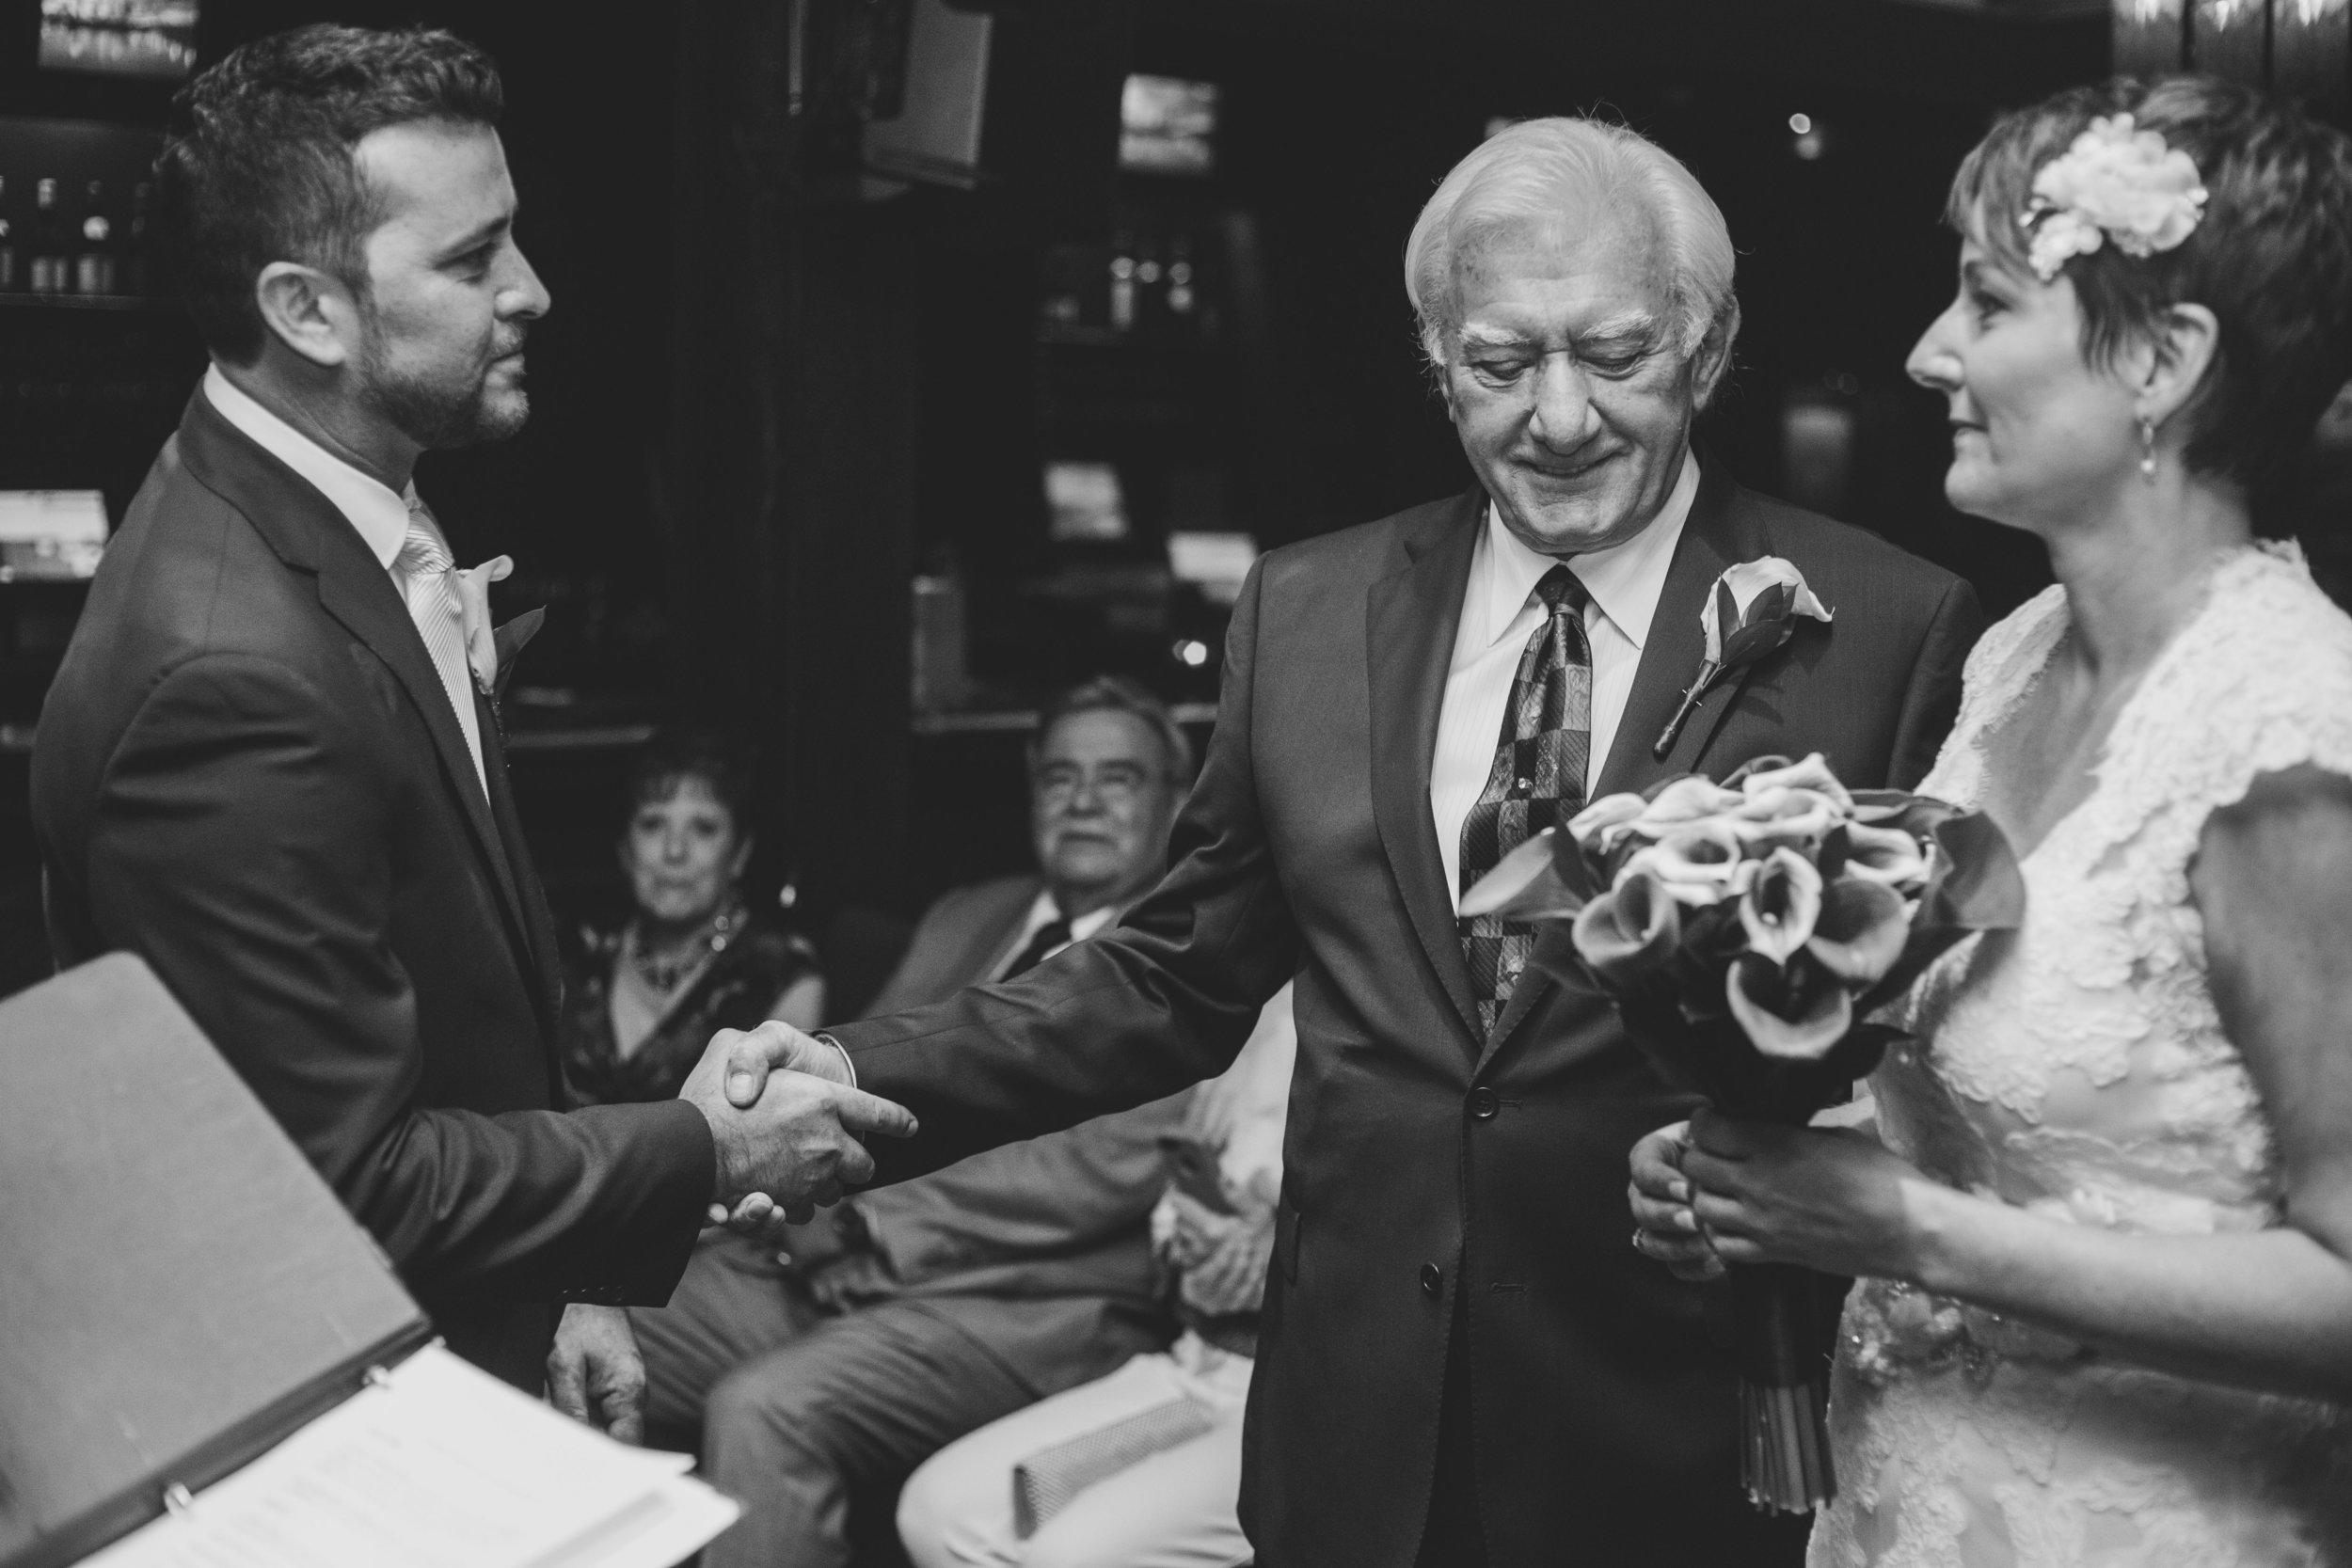 ATGI_Kat and Gabe Wedding 2016_2S8A5301.jpg